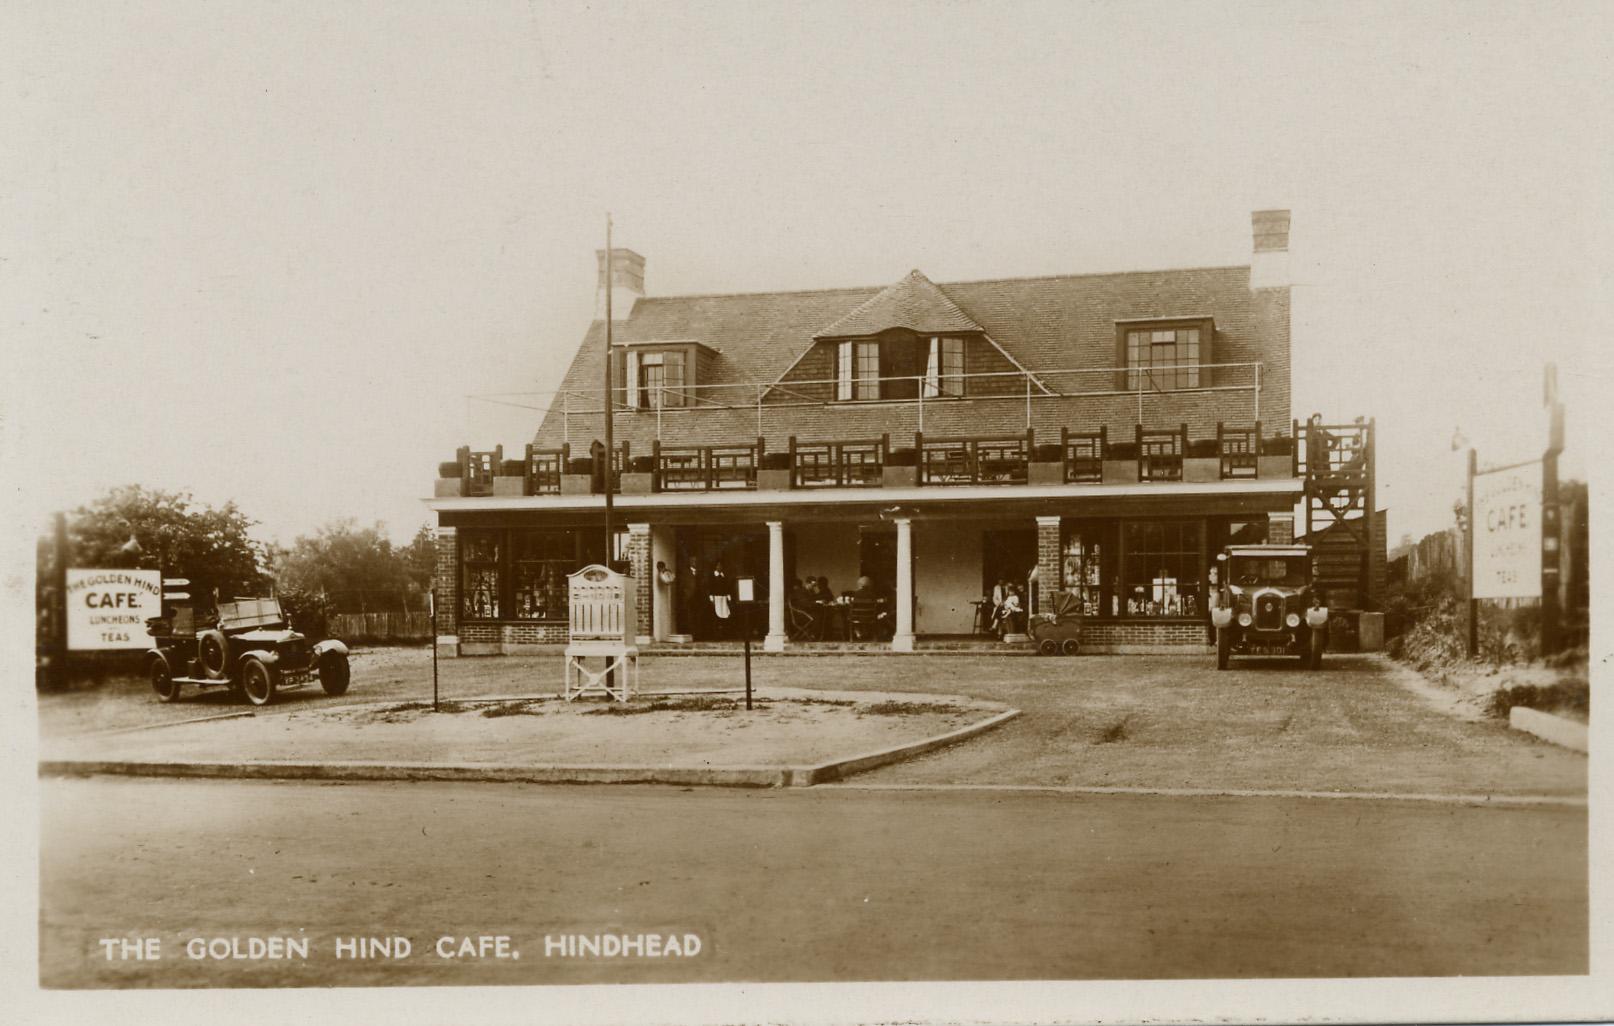 The 'Golden Hind' café 1920's